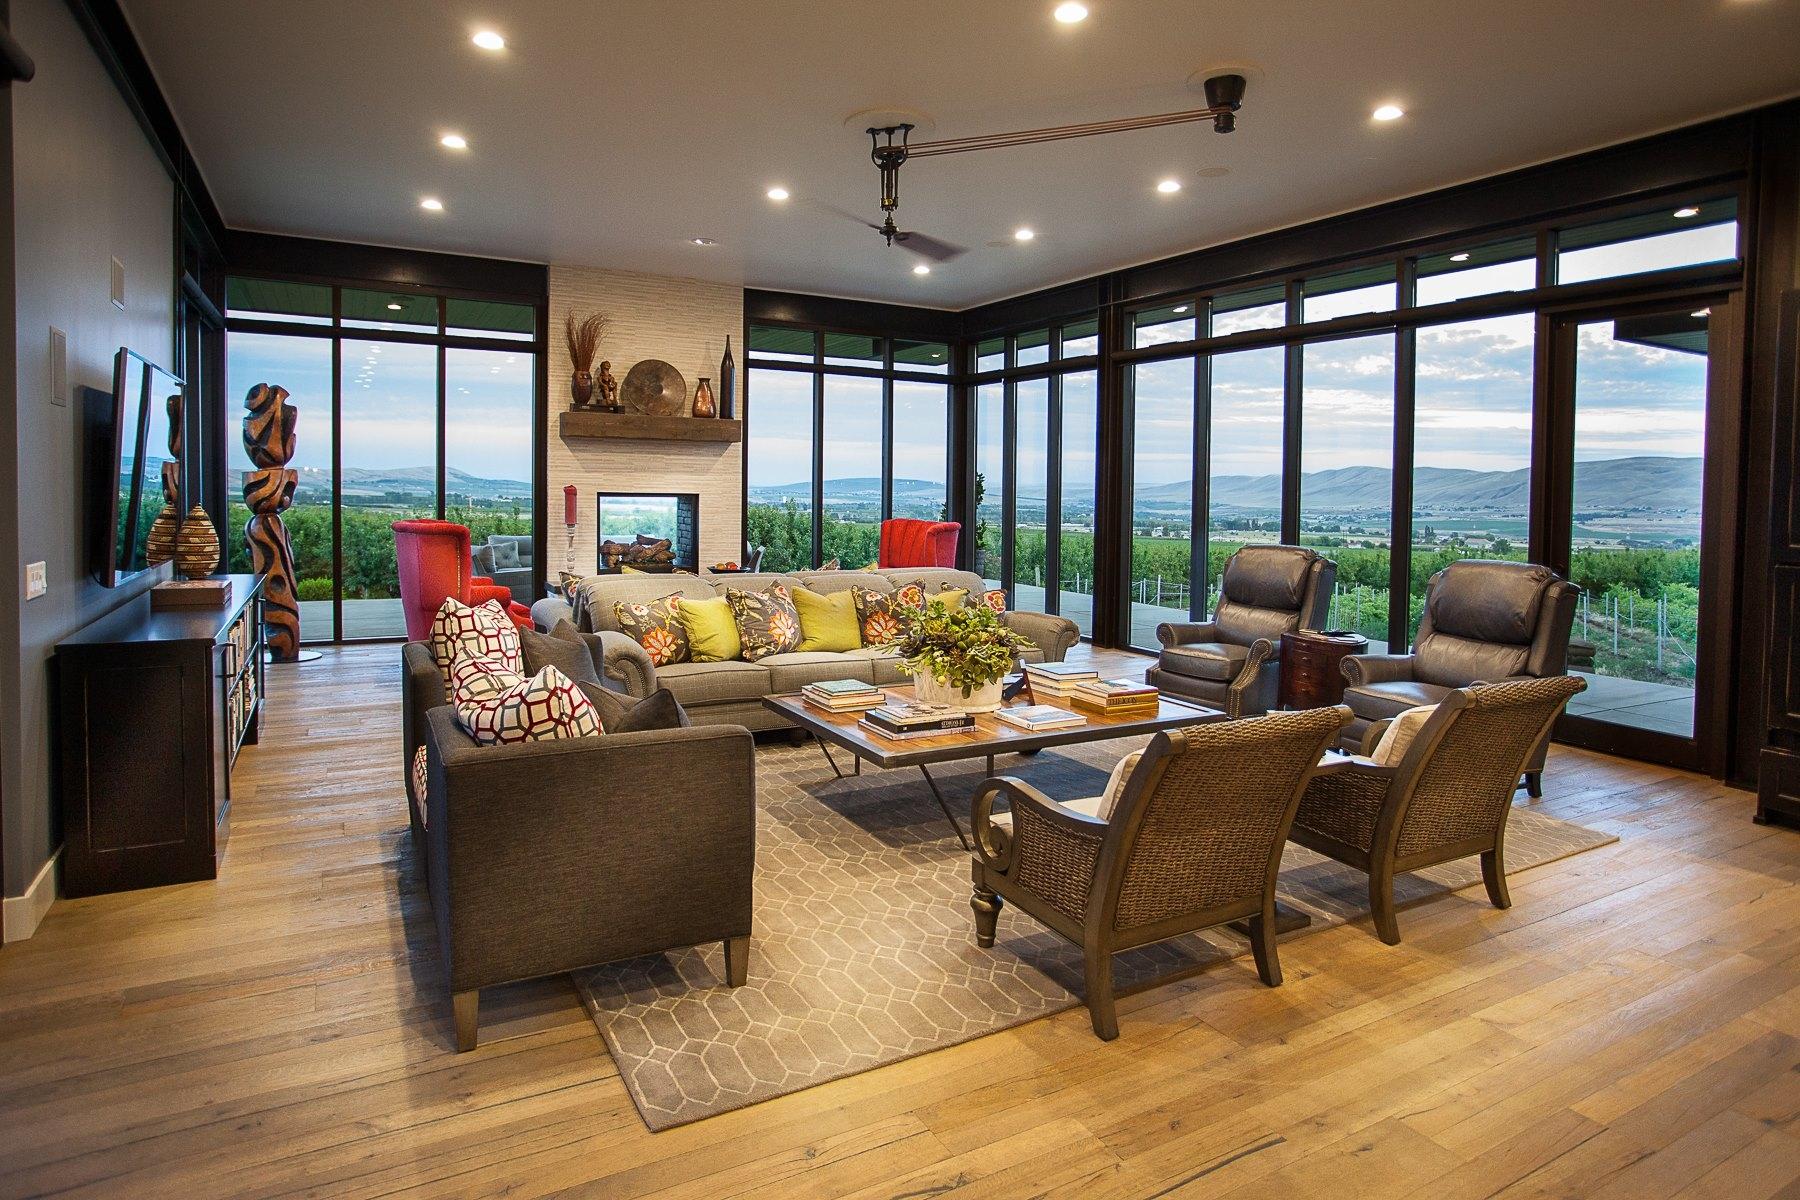 Spencer carlson furniture design in kennewick wa 99336 for Furniture kennewick wa